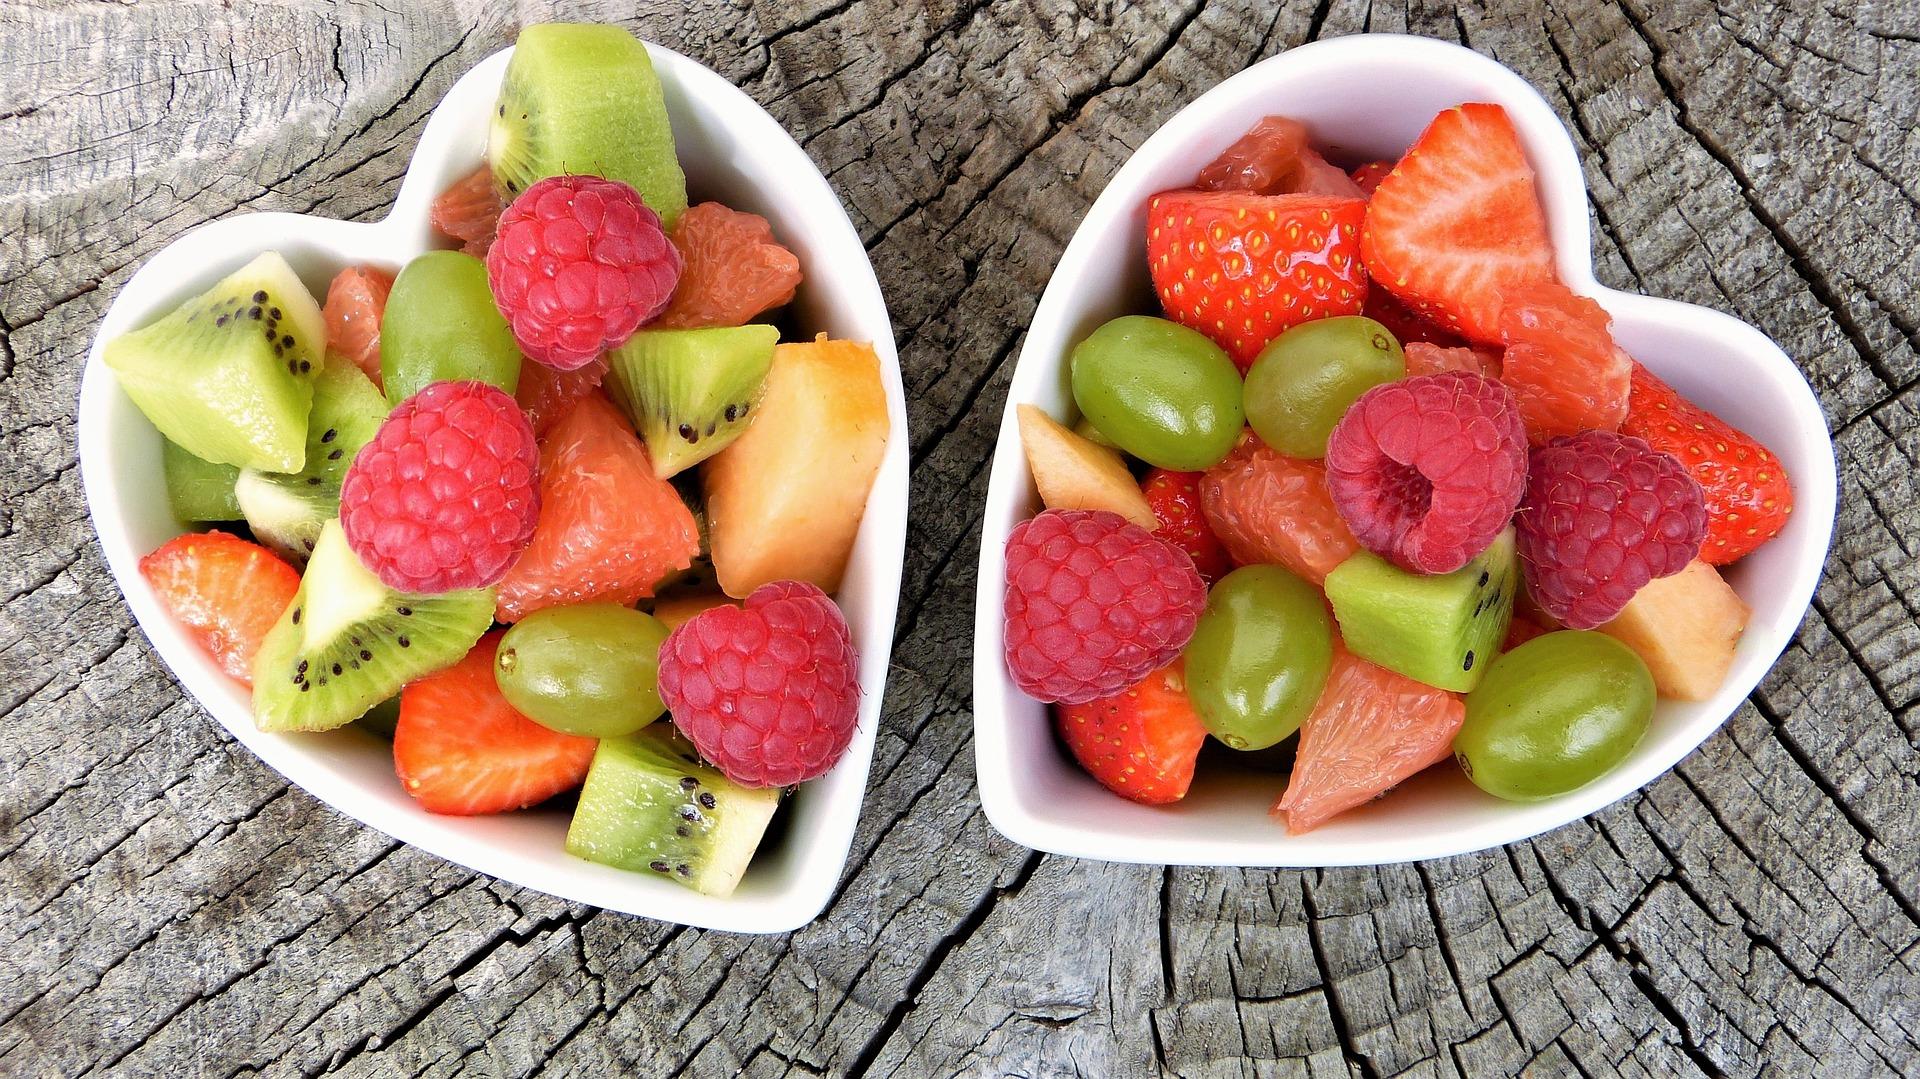 Dieta Settimanale Equilibrata Per Dimagrire : Dieta sana ed equilibrata per dimagrire velocemente trucchi per